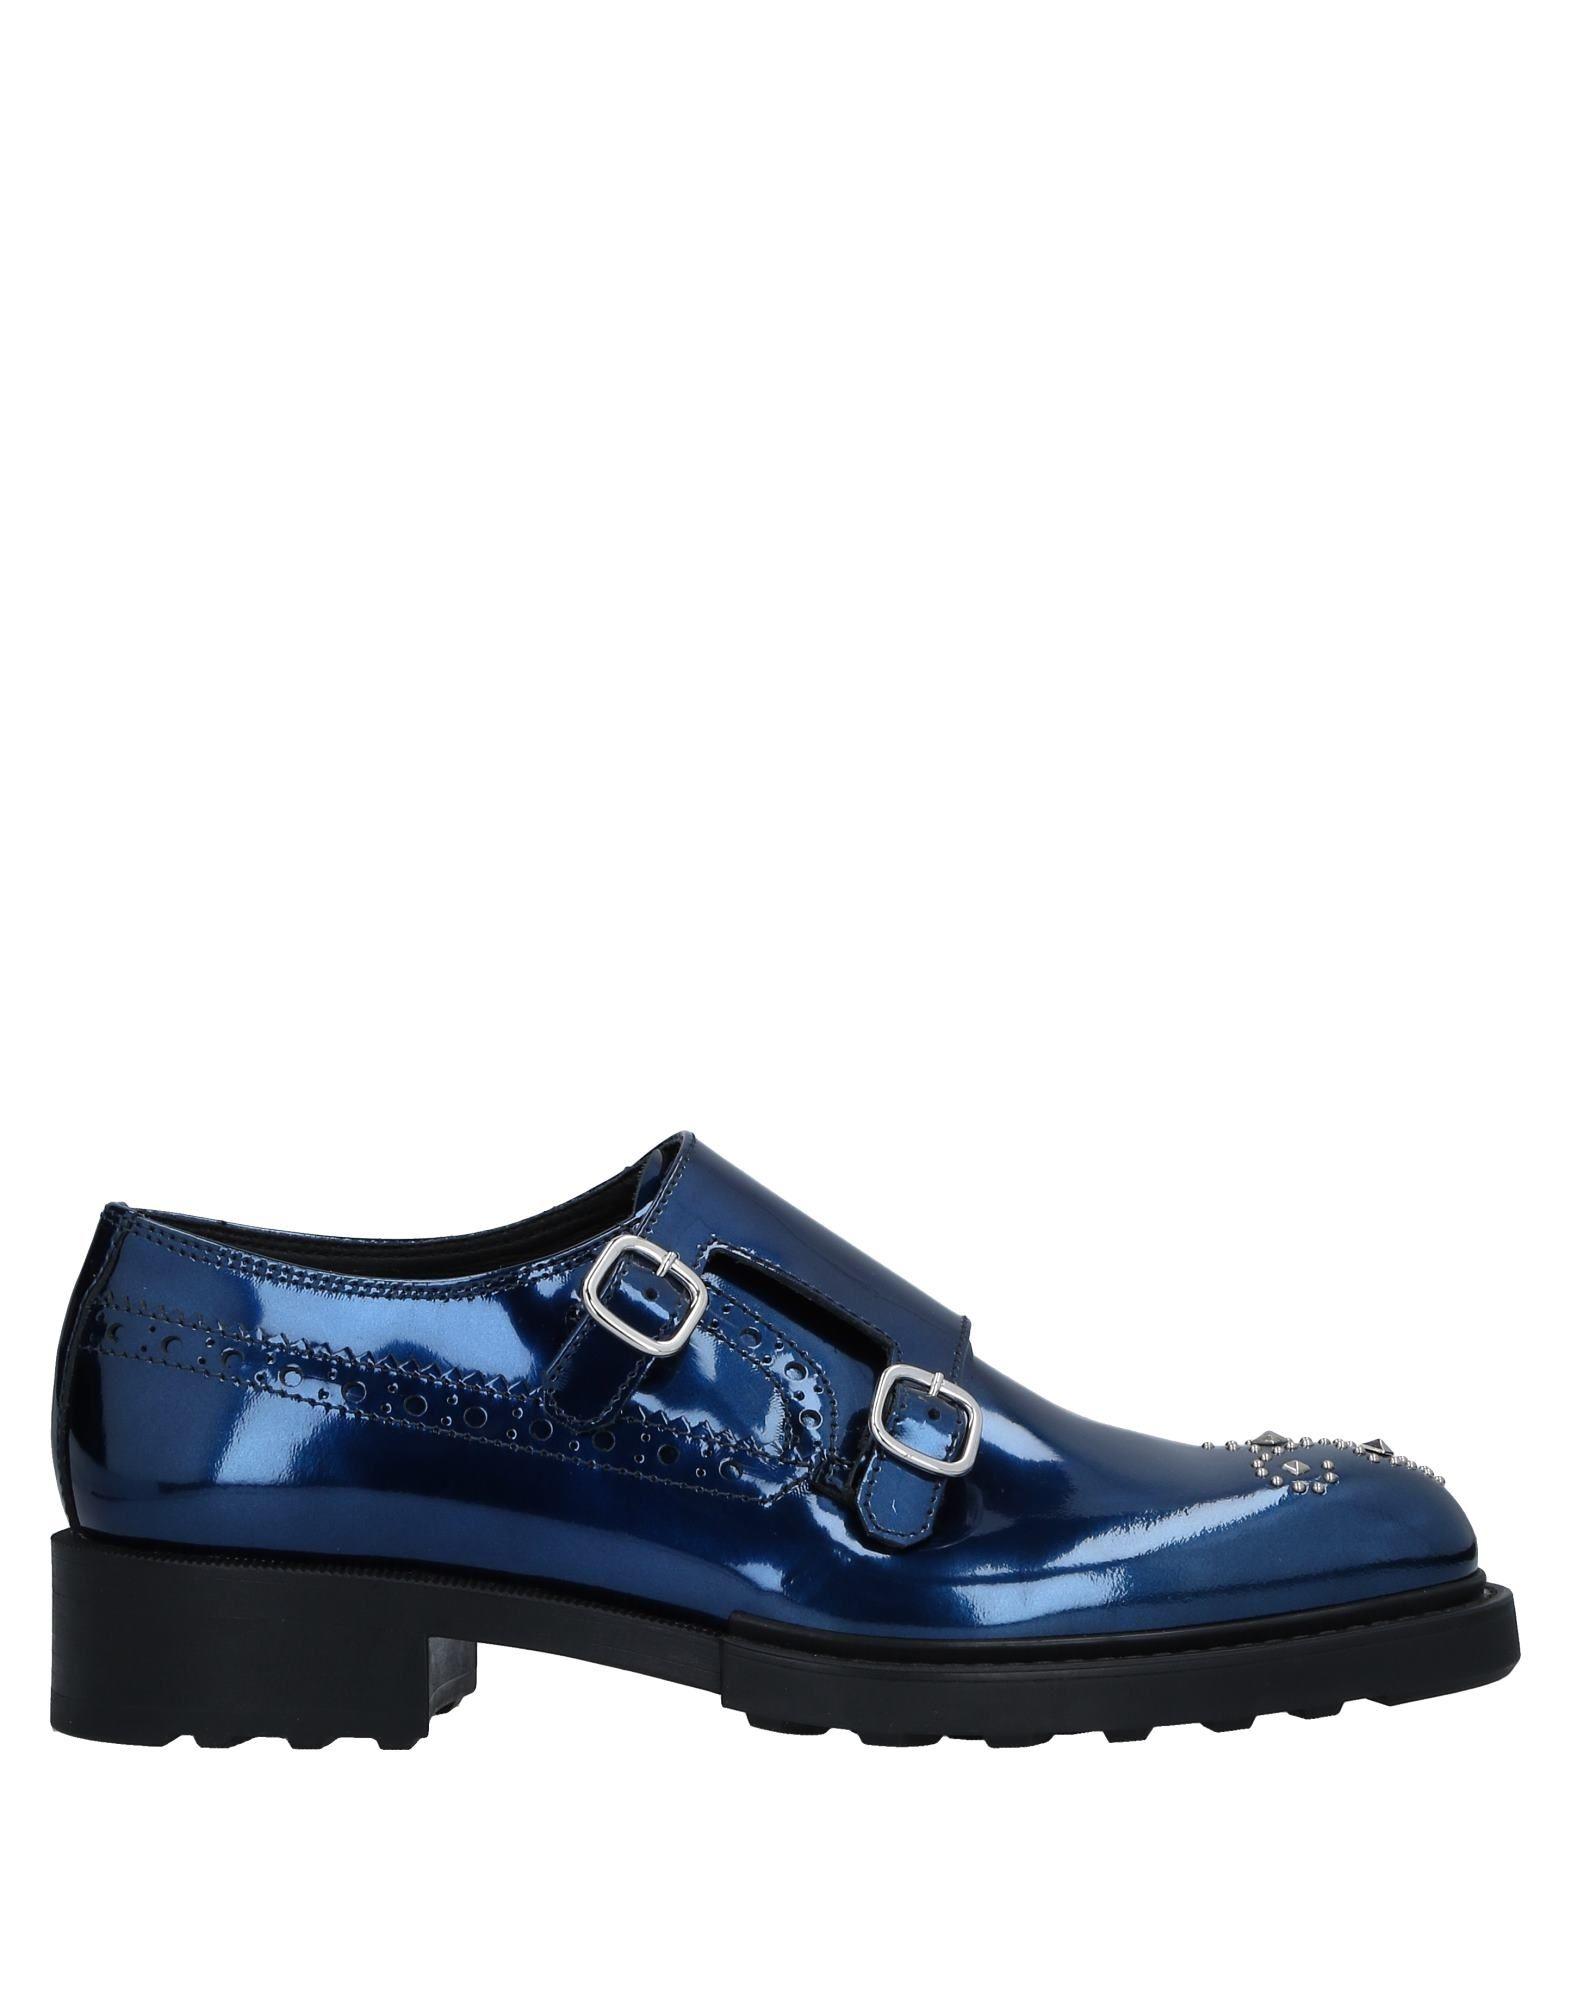 Rabatt  Schuhe Barracuda Mokassins Damen  Rabatt 11535126DR 5971cf